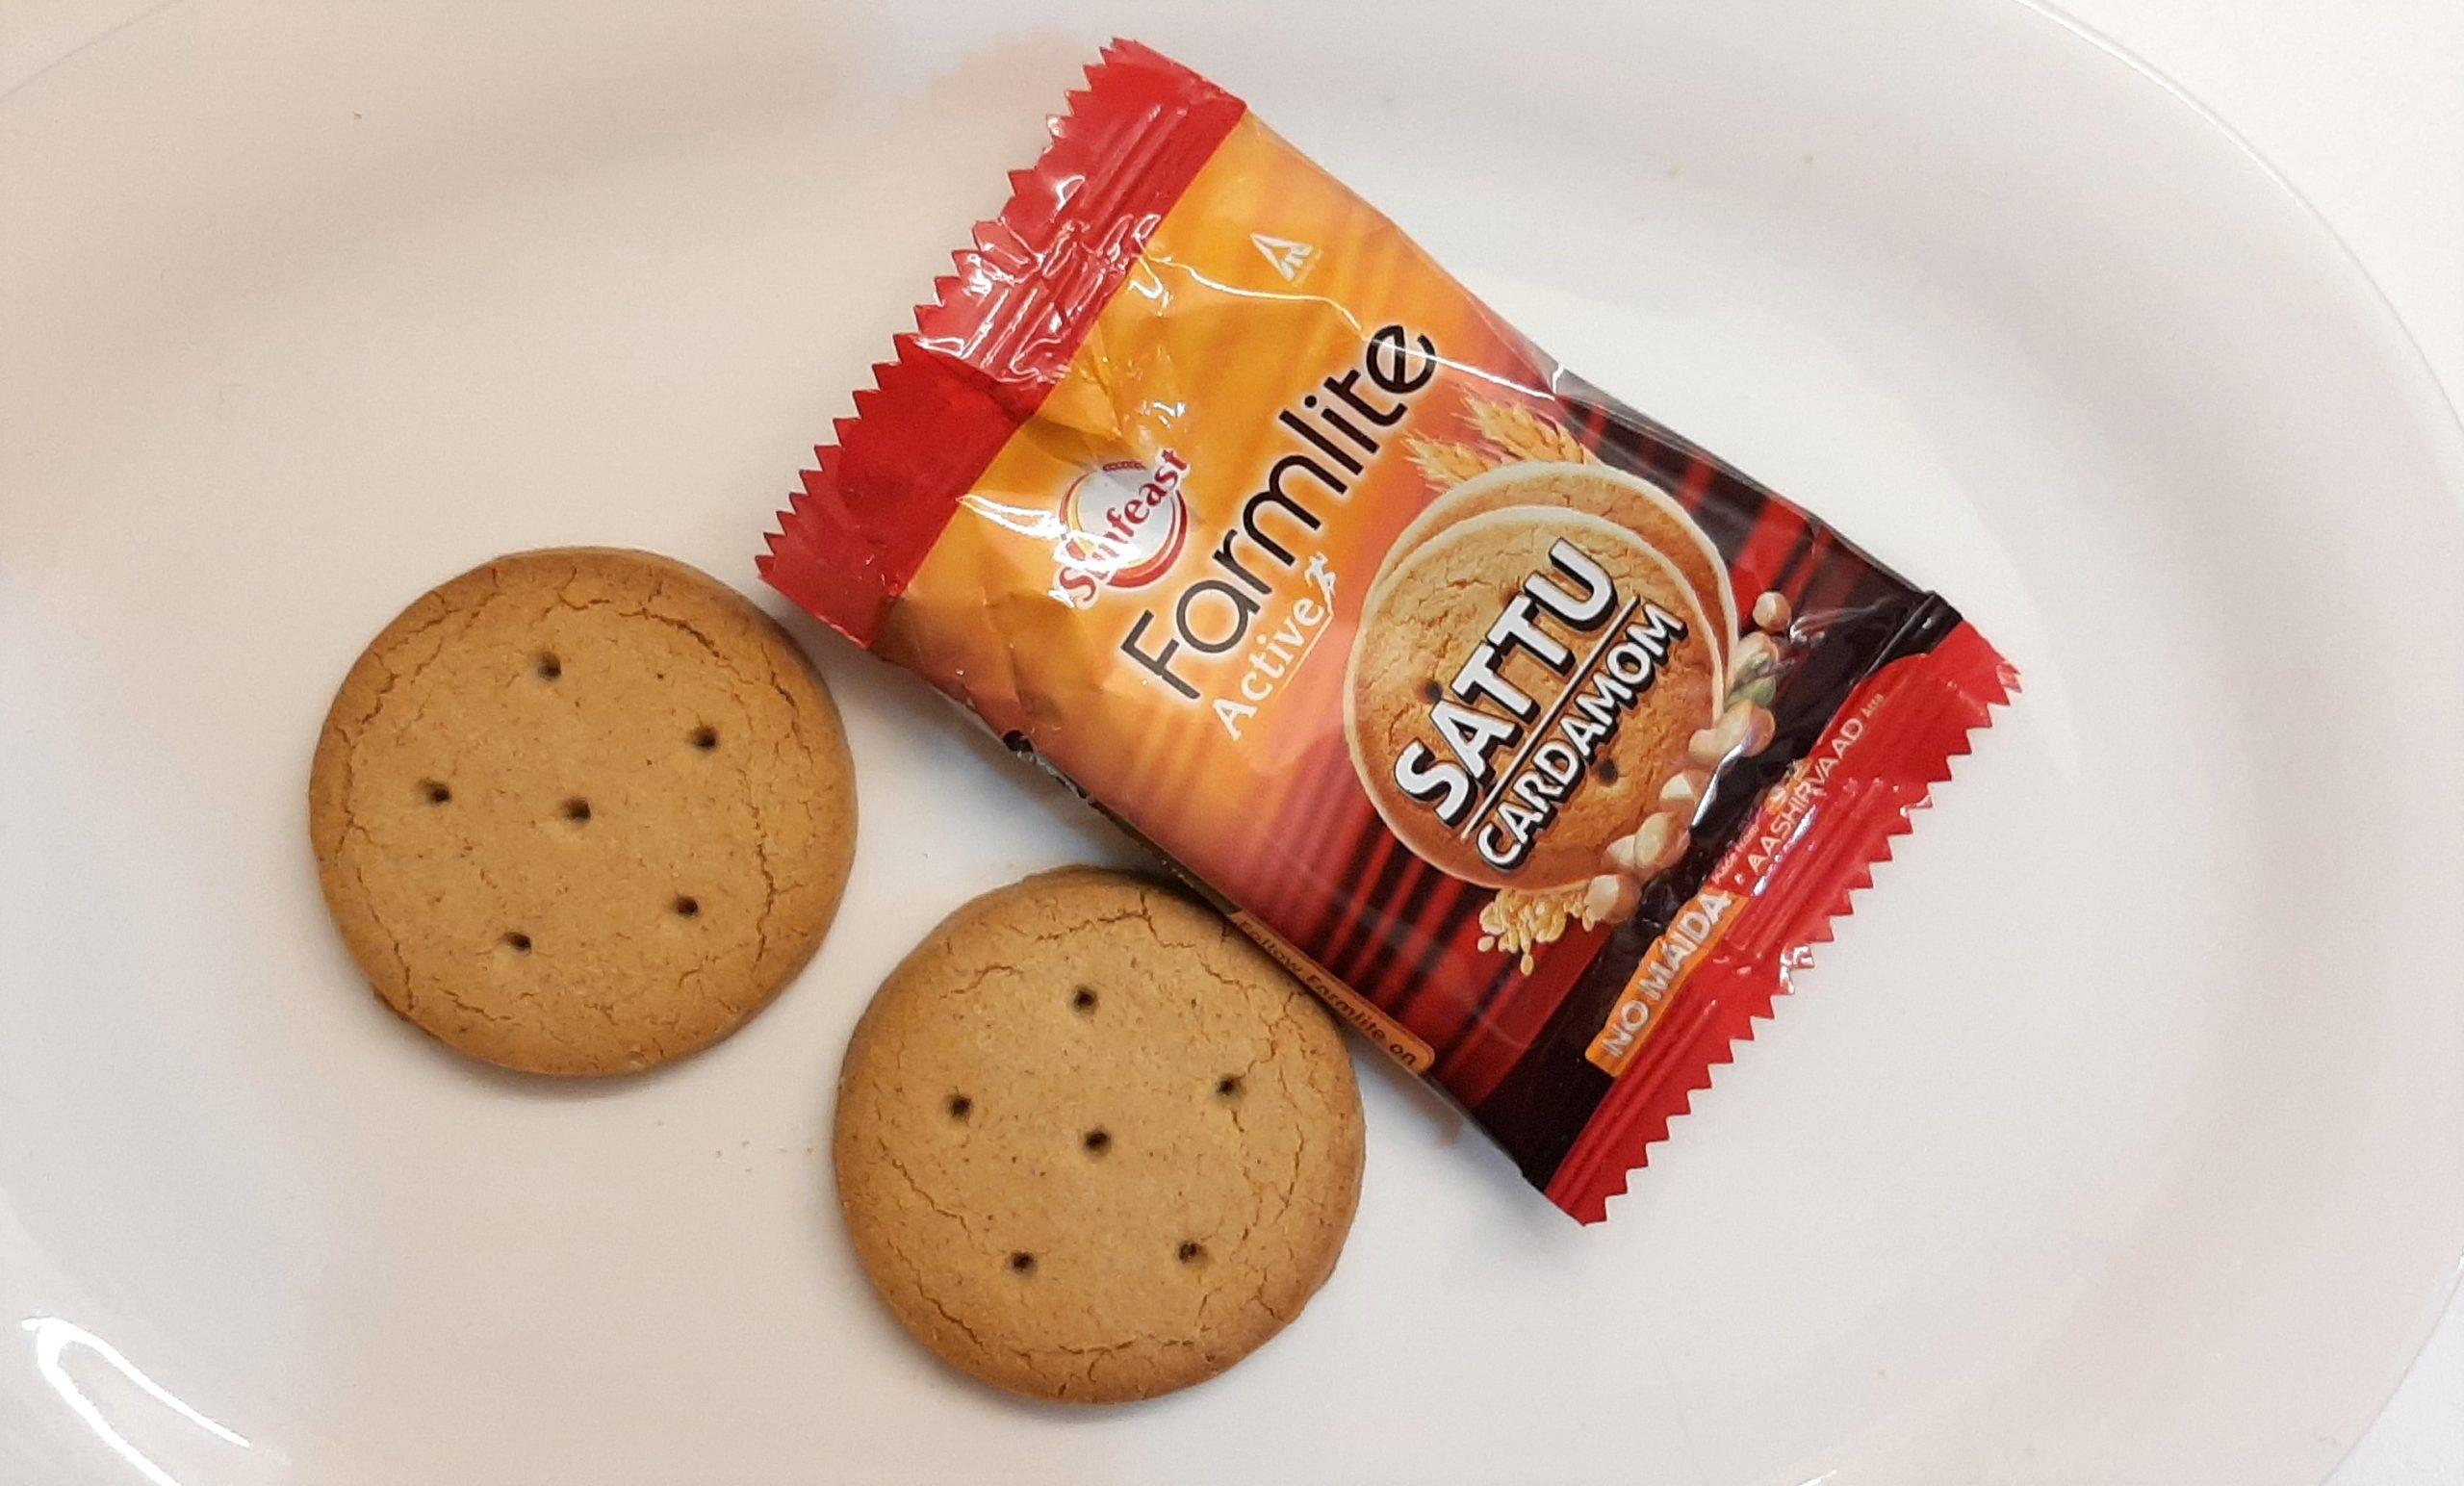 Sunfeast's Sattu Cardamom Biscuits Are Delish! #FirstImpressions